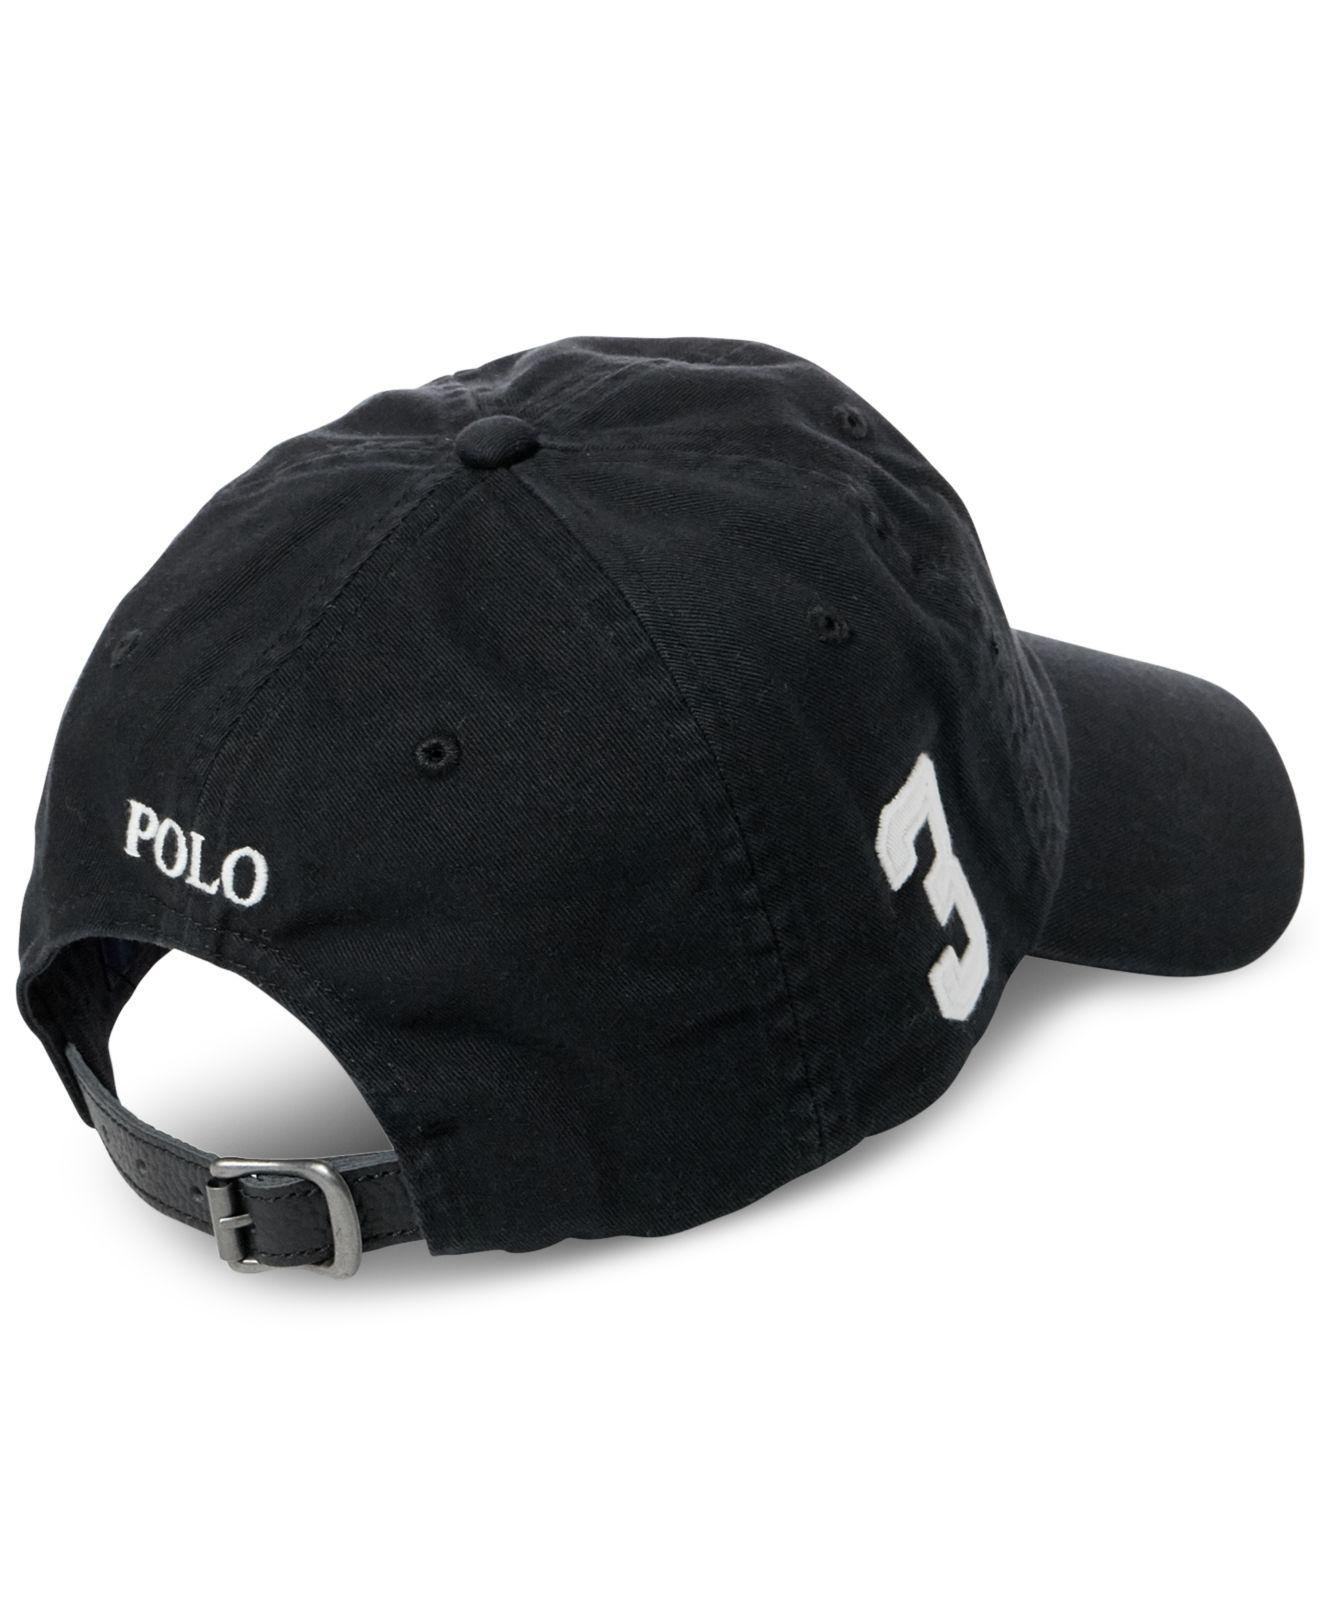 57b522ee823 Lyst - Polo Ralph Lauren Logo Baseball Cap in Black for Men - Save 51%